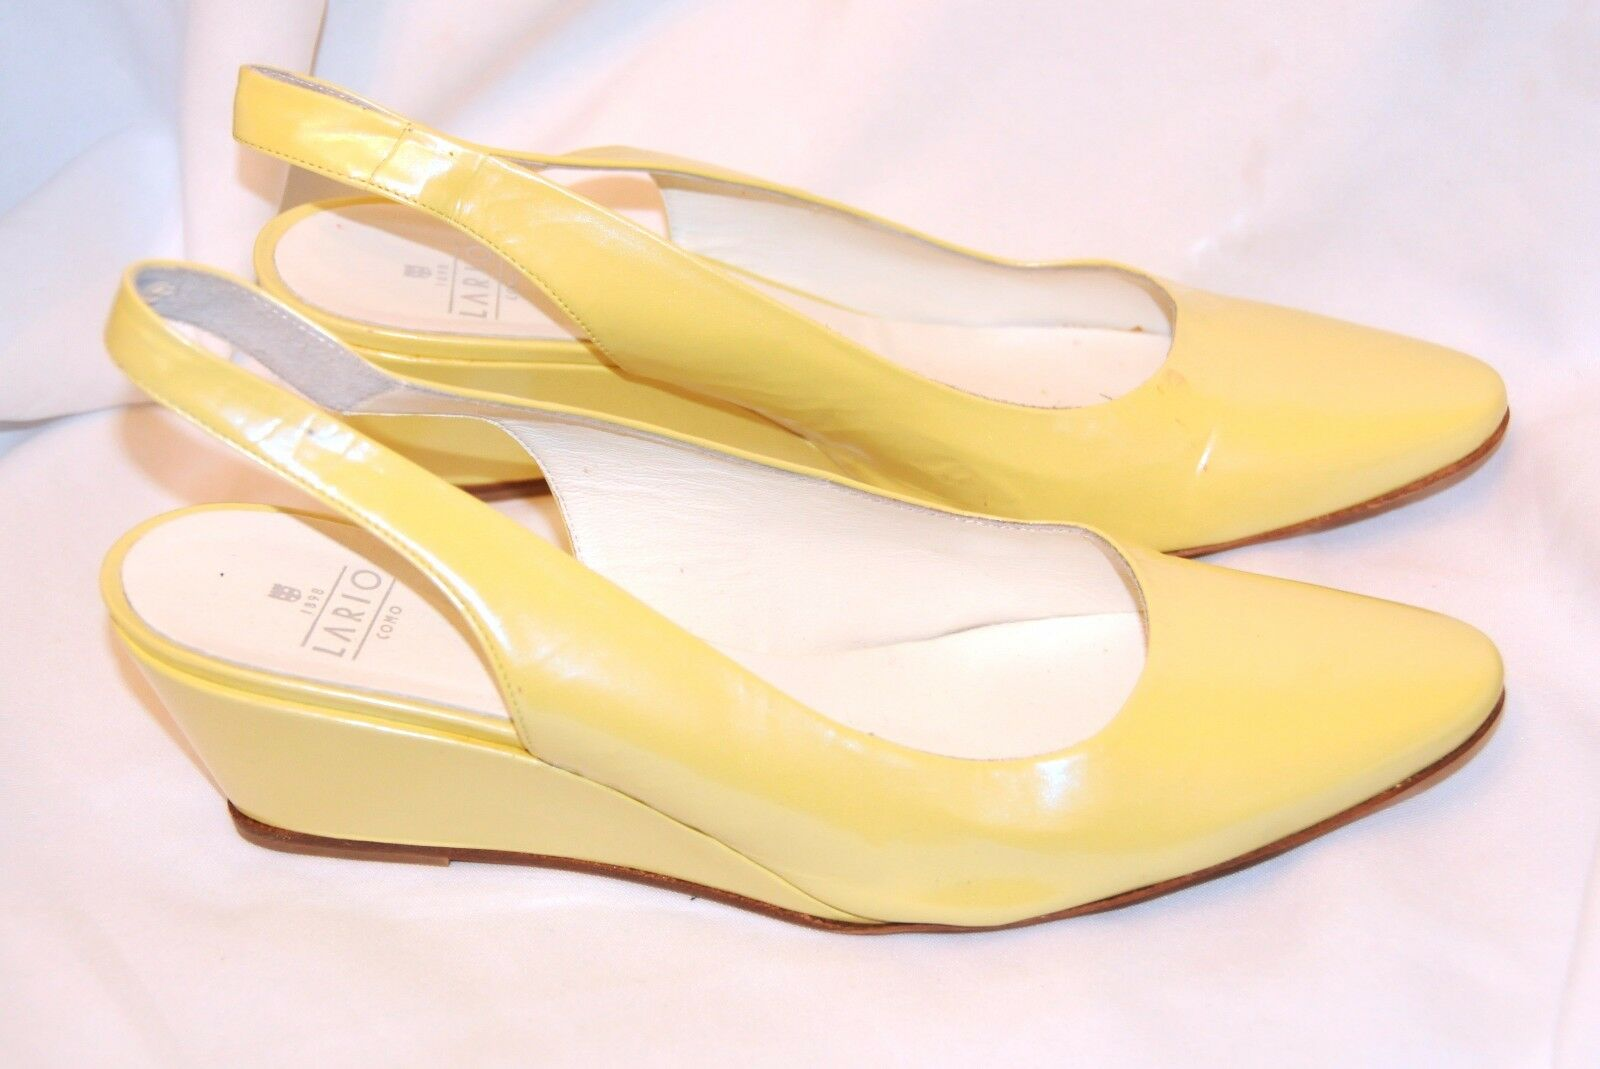 LIGHT YELLOW LARIO COMO LADIES Schuhe SIZE EU 42 UK 7.5-8 WEDGE SLINGBACK BNTW